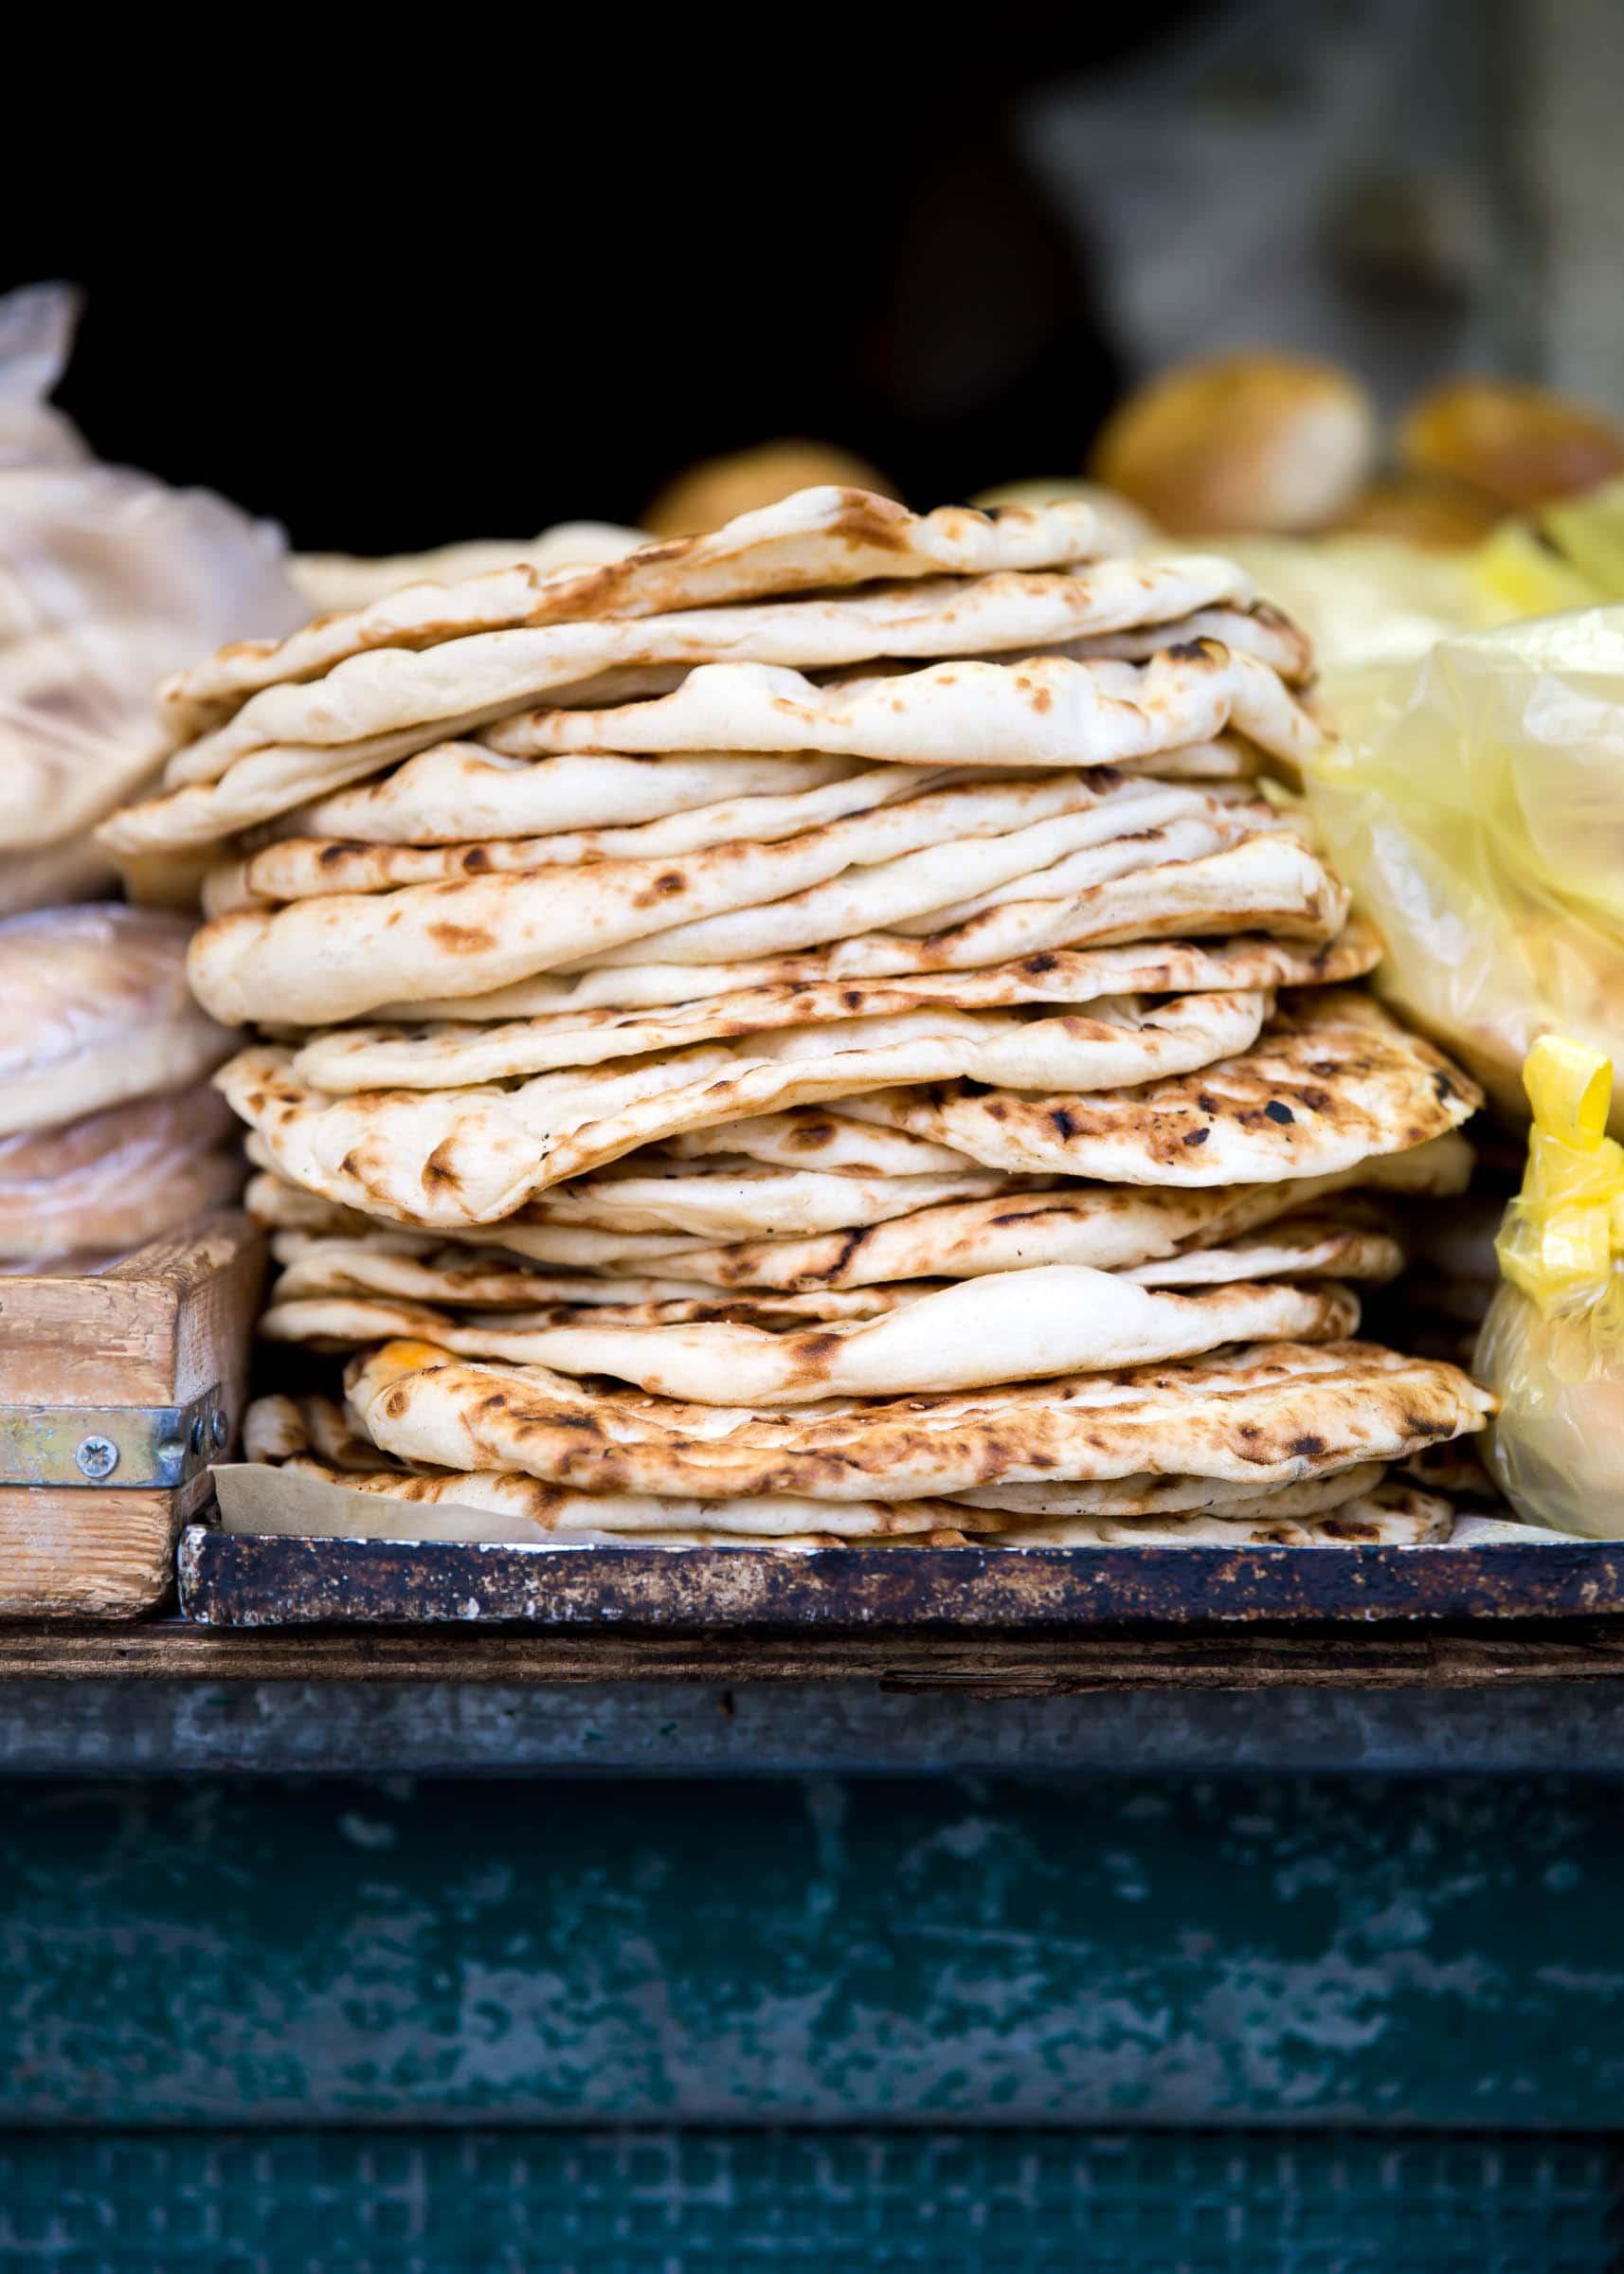 Foodie's Guide To Israel